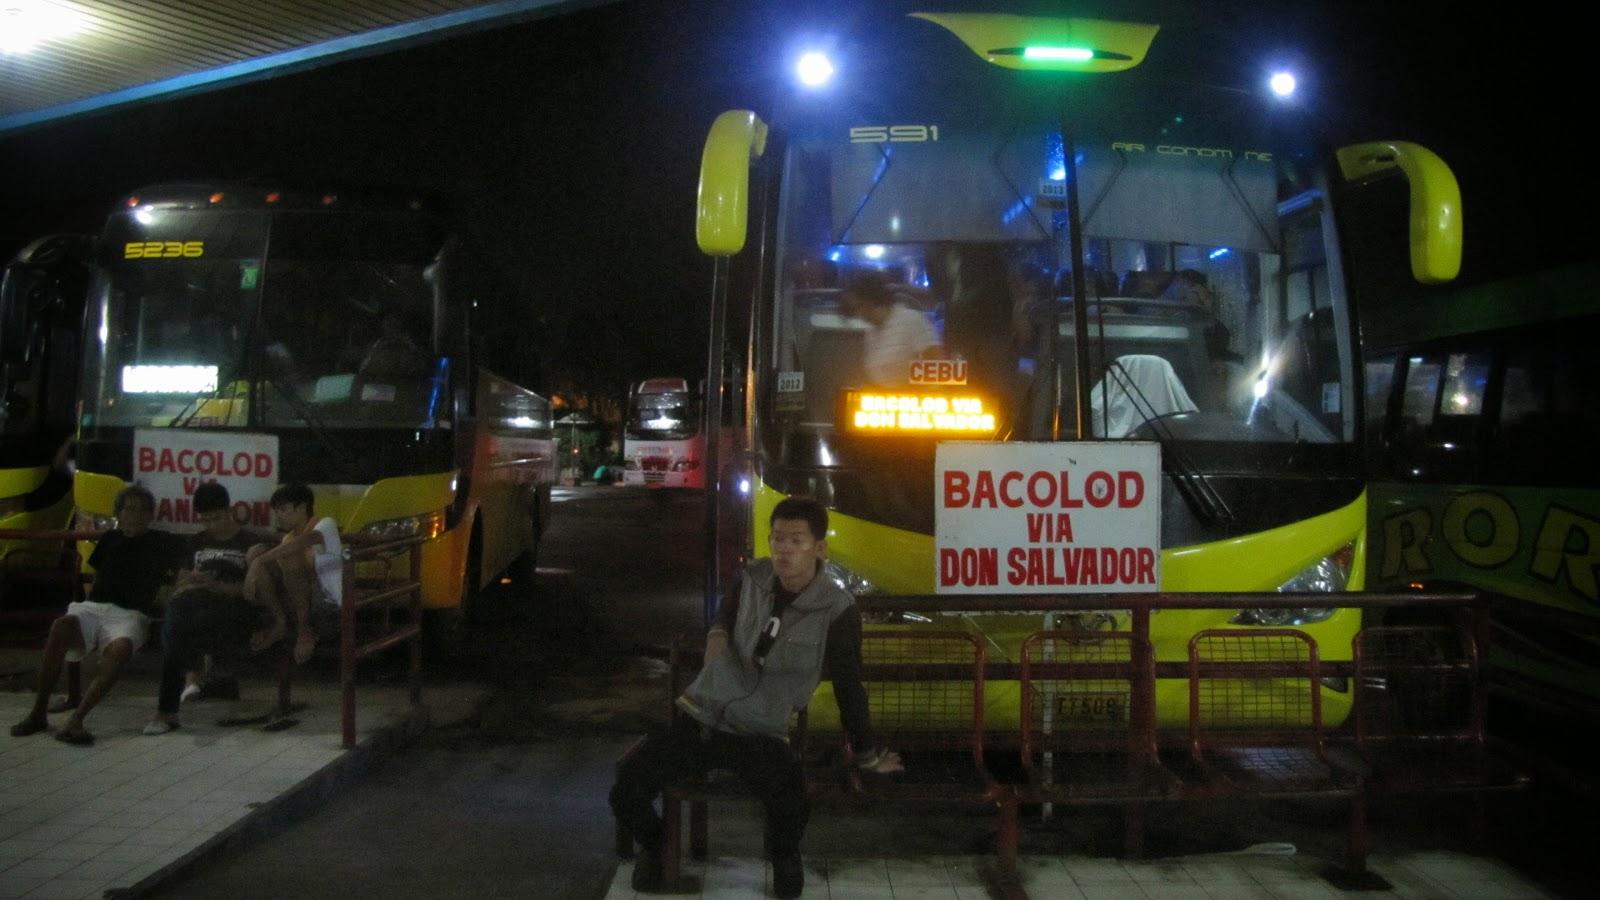 bacolod, cebu north terminal, cebu-bacolod, ceres bus